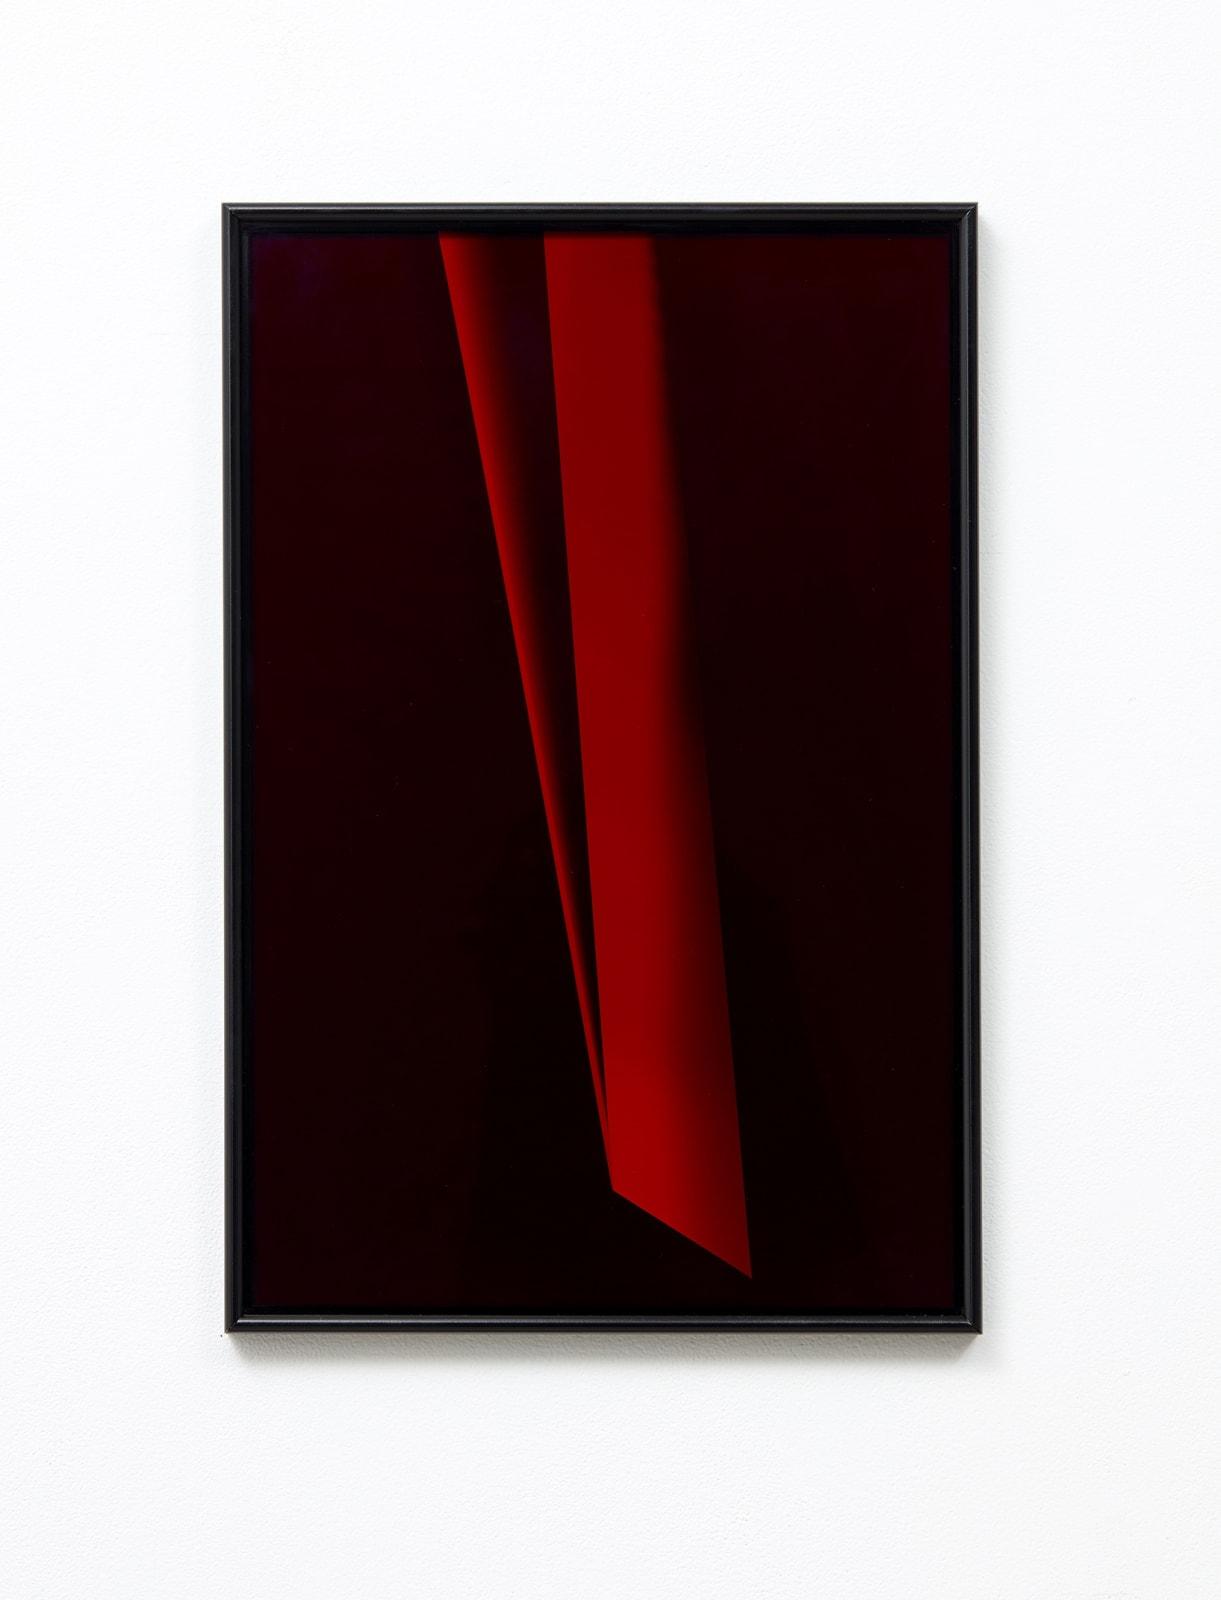 Andrew Beck Spilt Focus (red II) 2018